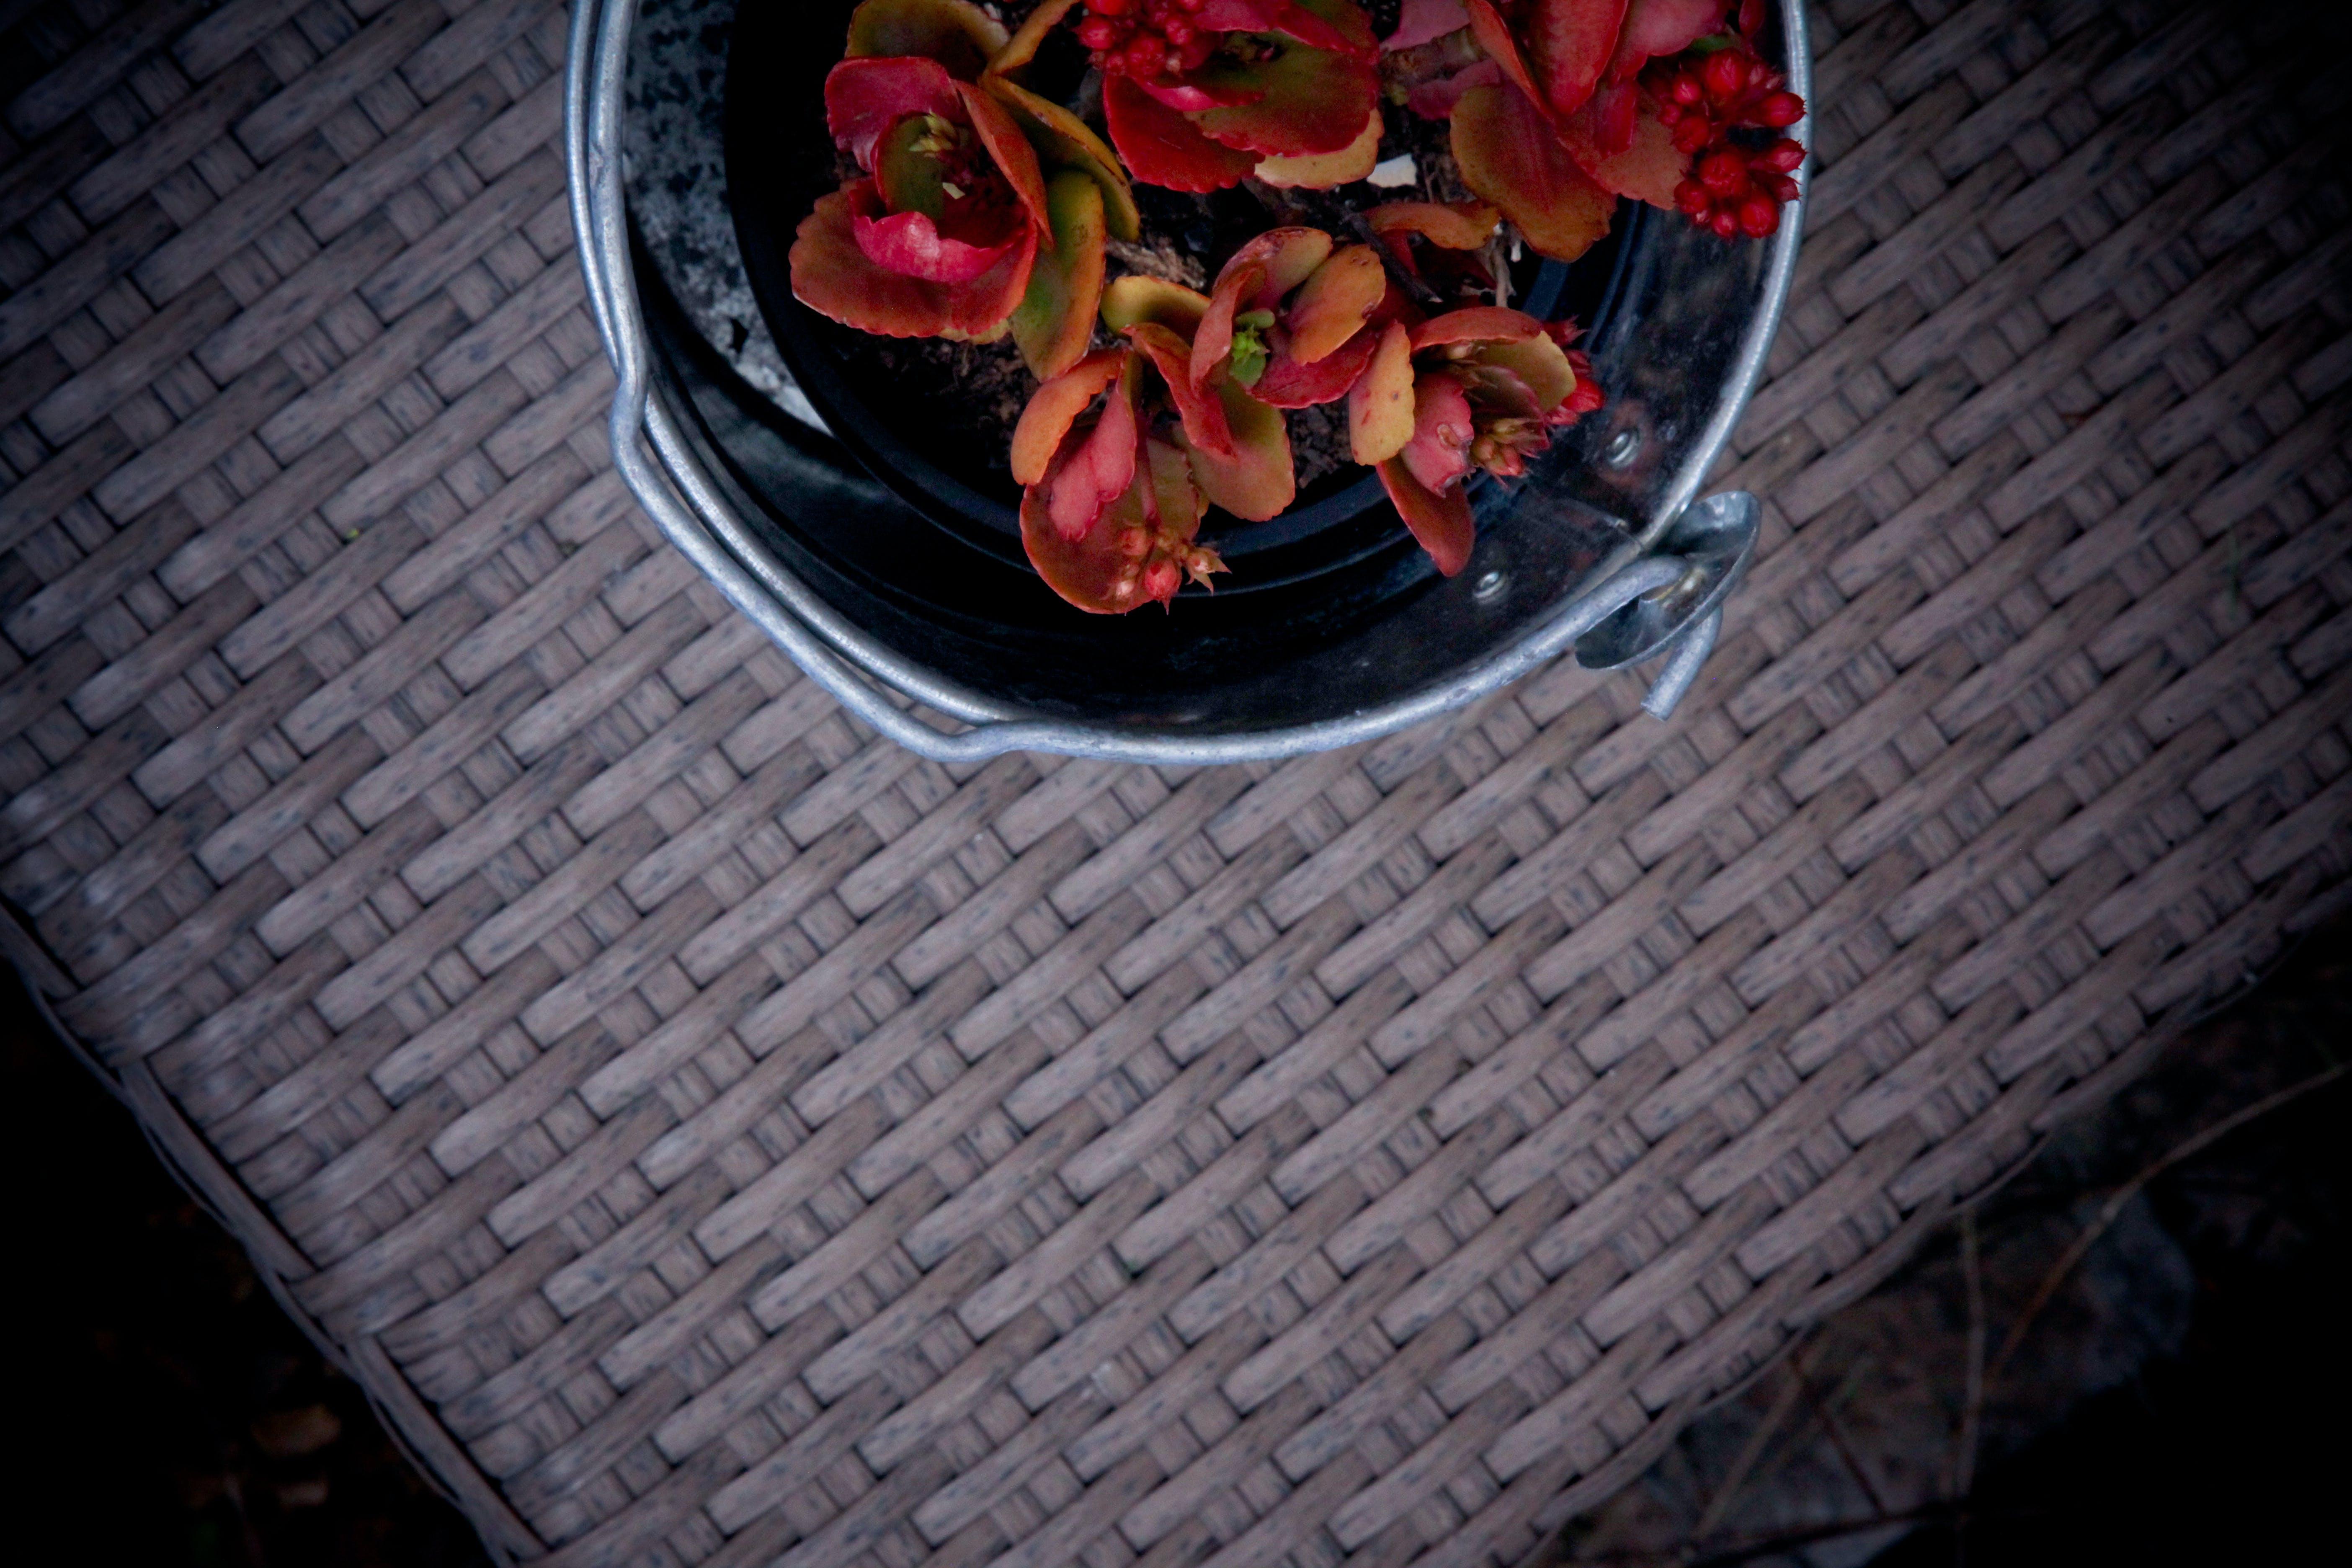 Kostenloses Stock Foto zu gartenpflanze, löffel, rote pflanze, traceyshawphotography